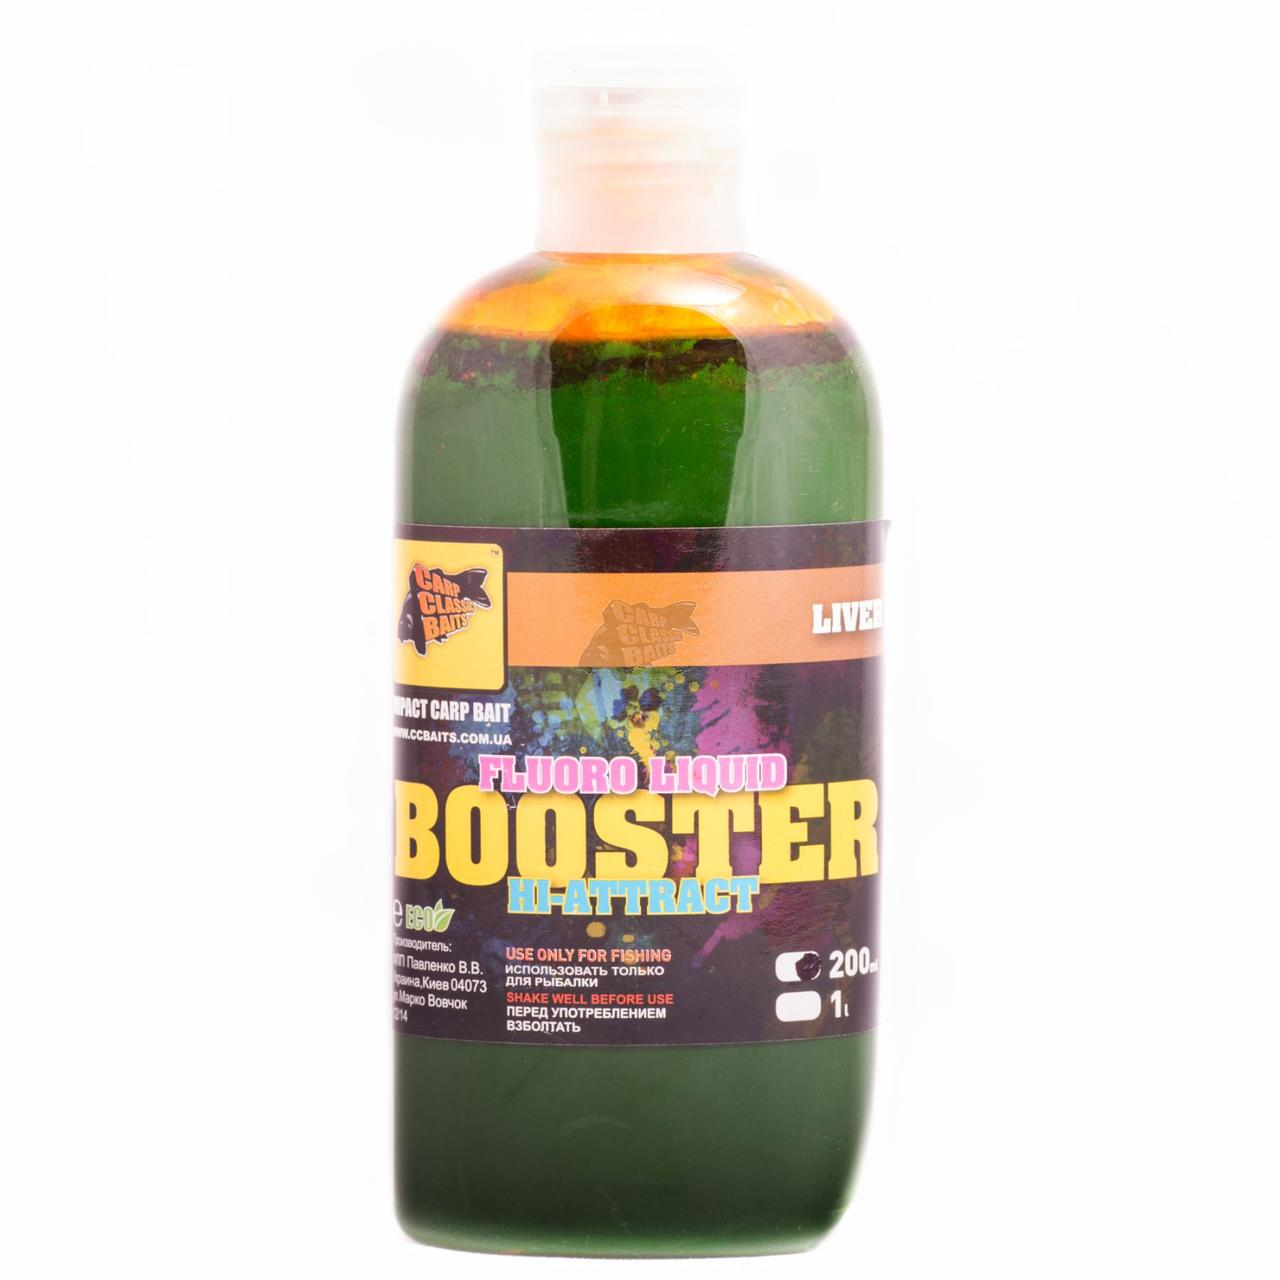 Бустер Fluoro Liquid Hi-Attract, Liver [Печень], 200